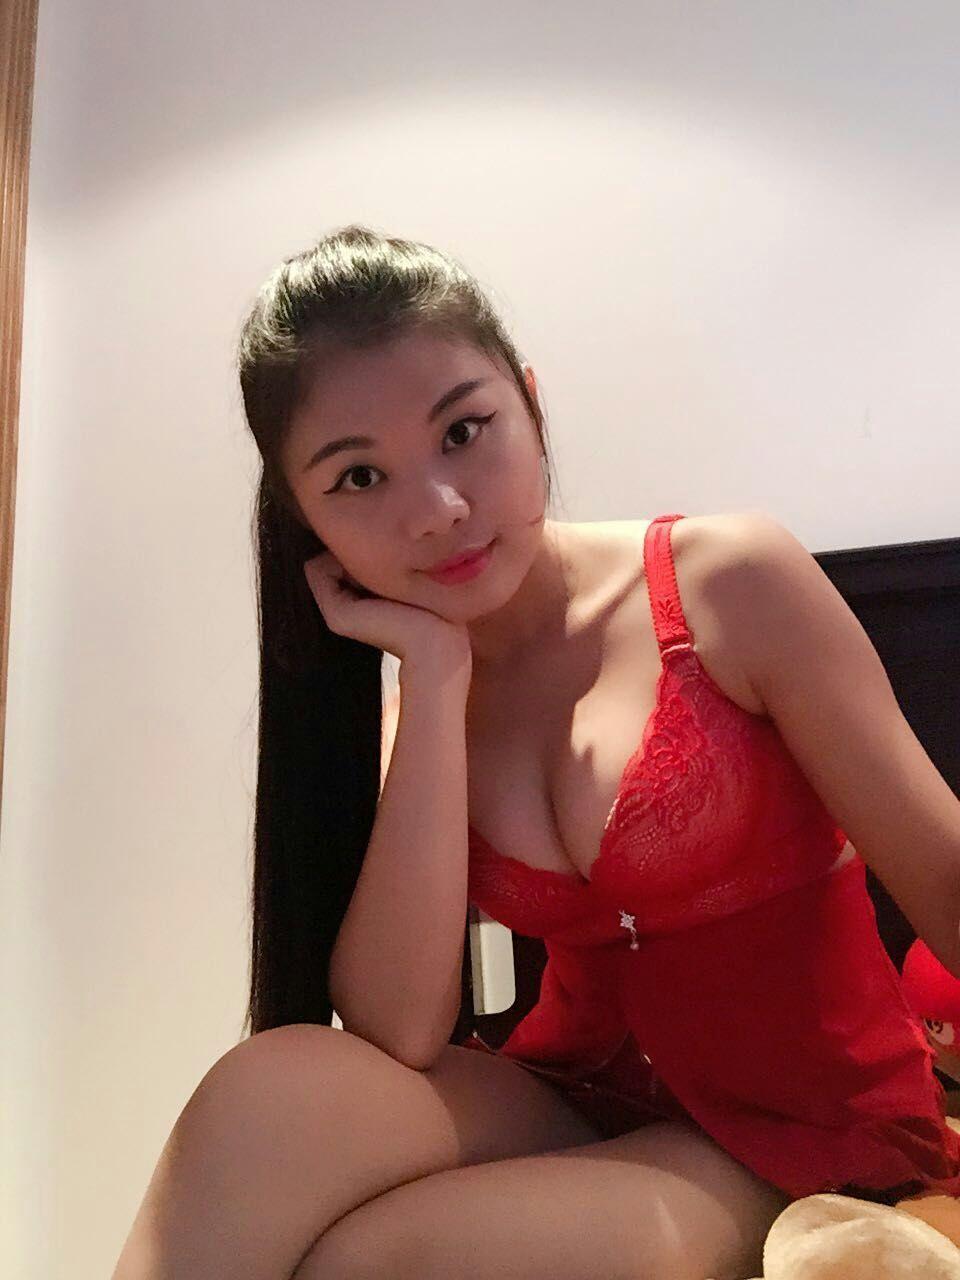 asian escort services adult escort service